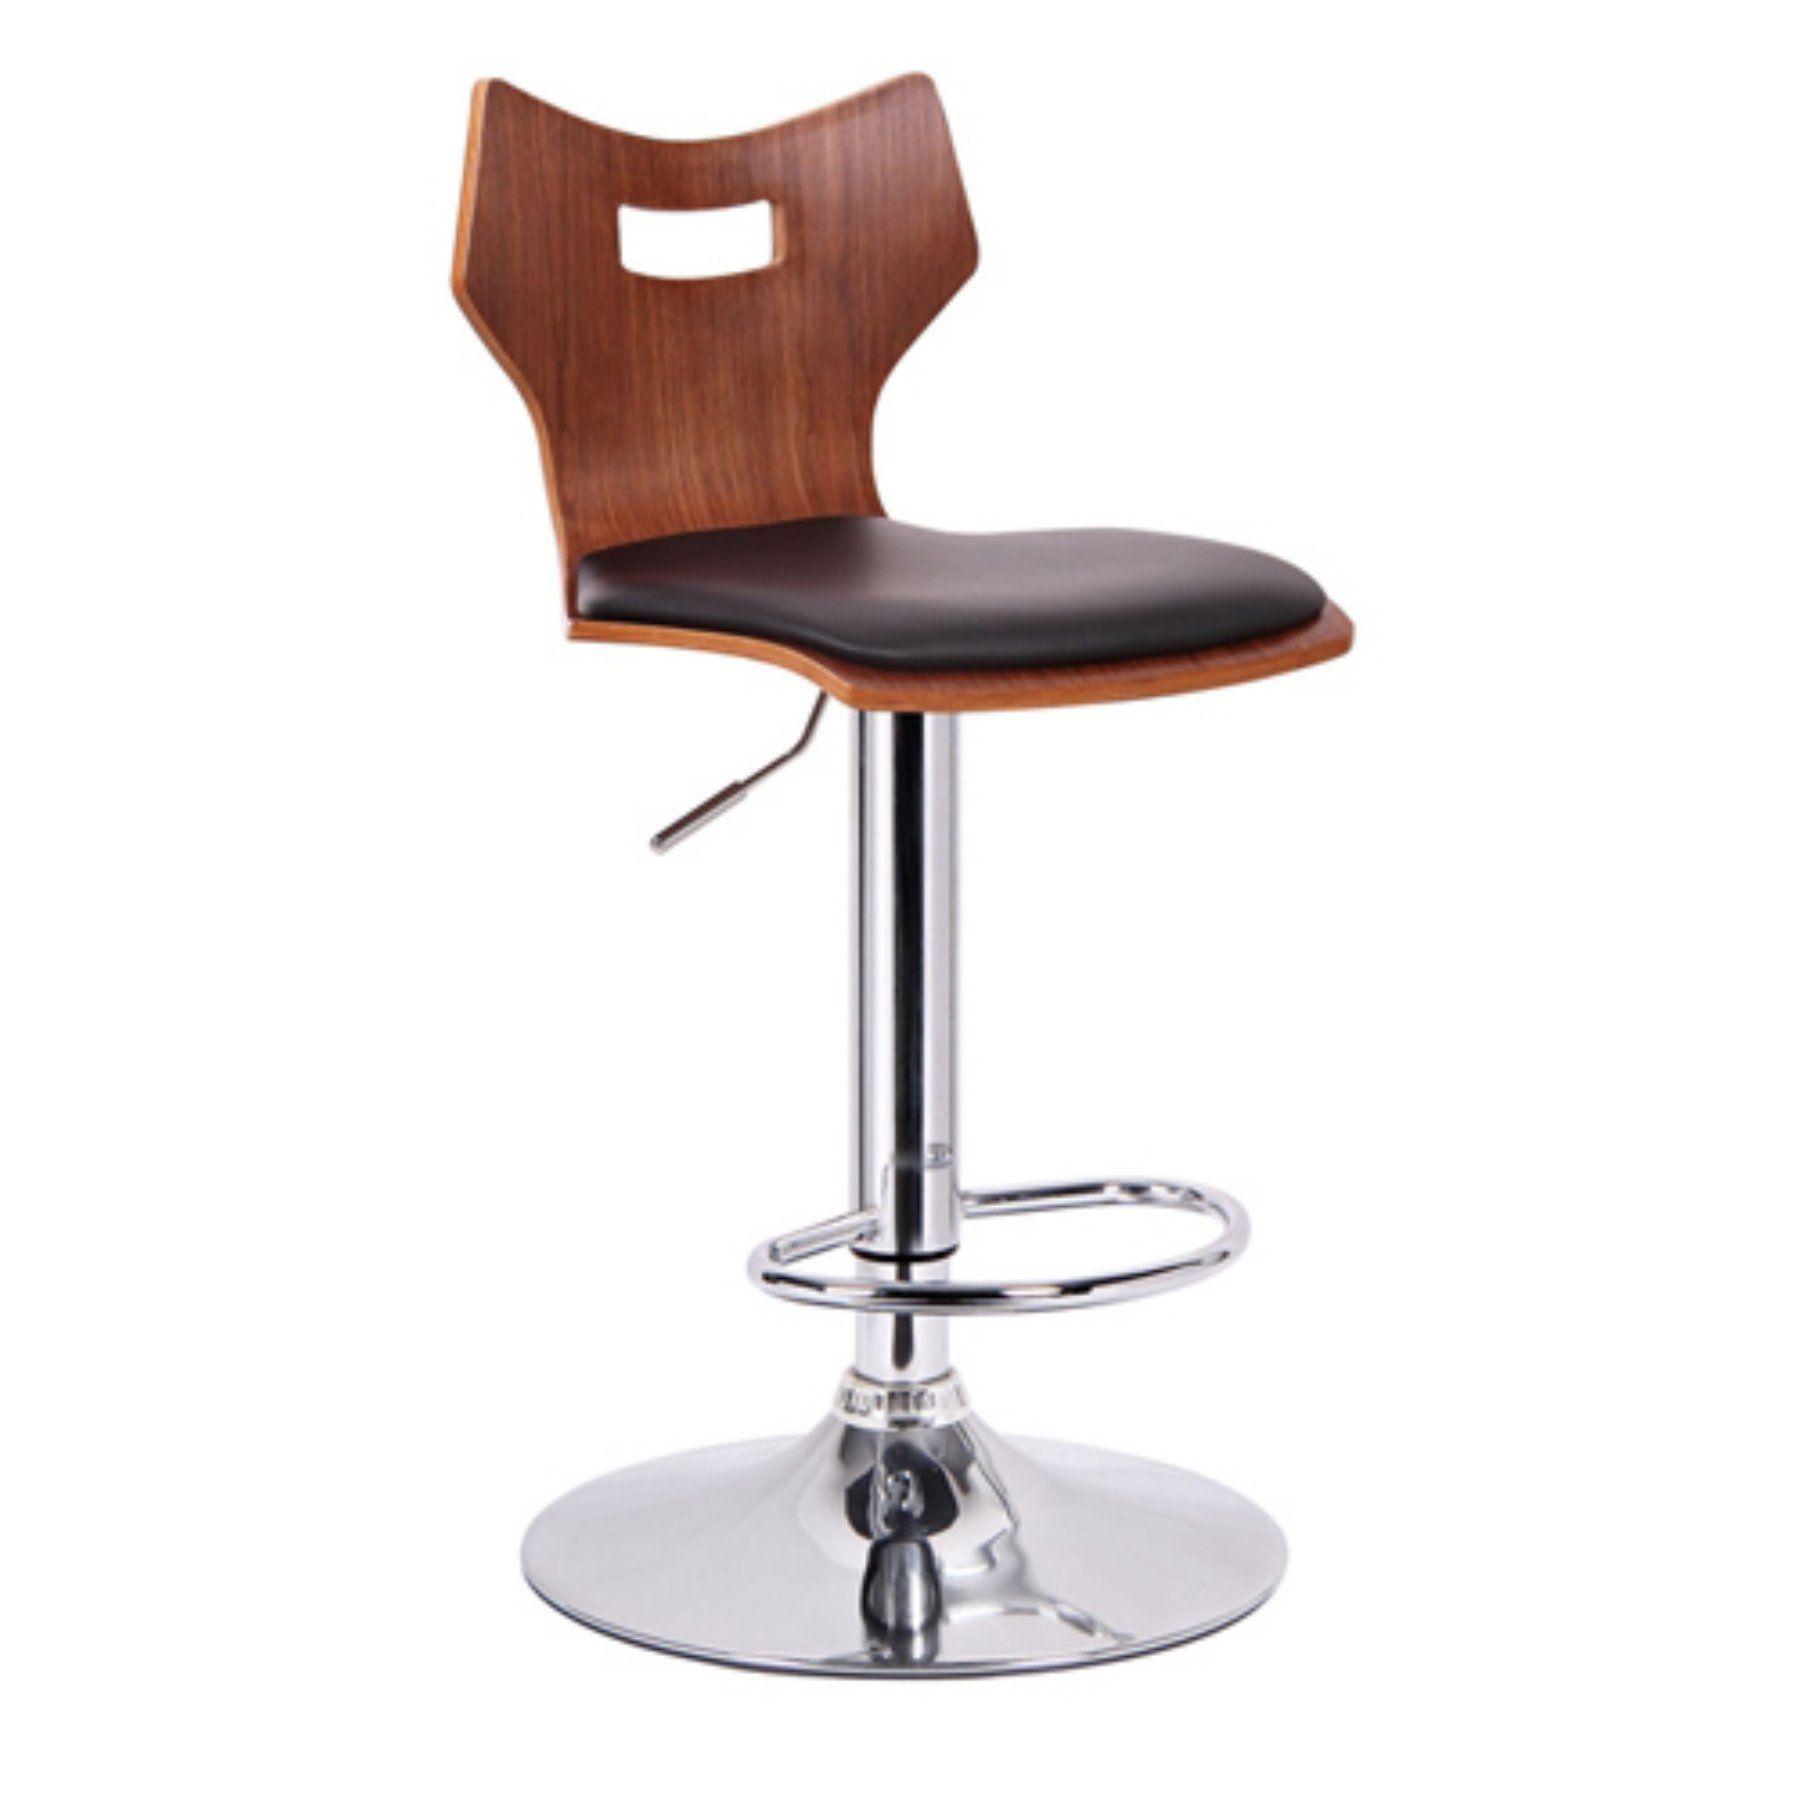 Marvelous Baxton Studio Amery Adjustable Bar Stools Set Of 2 Sd Uwap Interior Chair Design Uwaporg